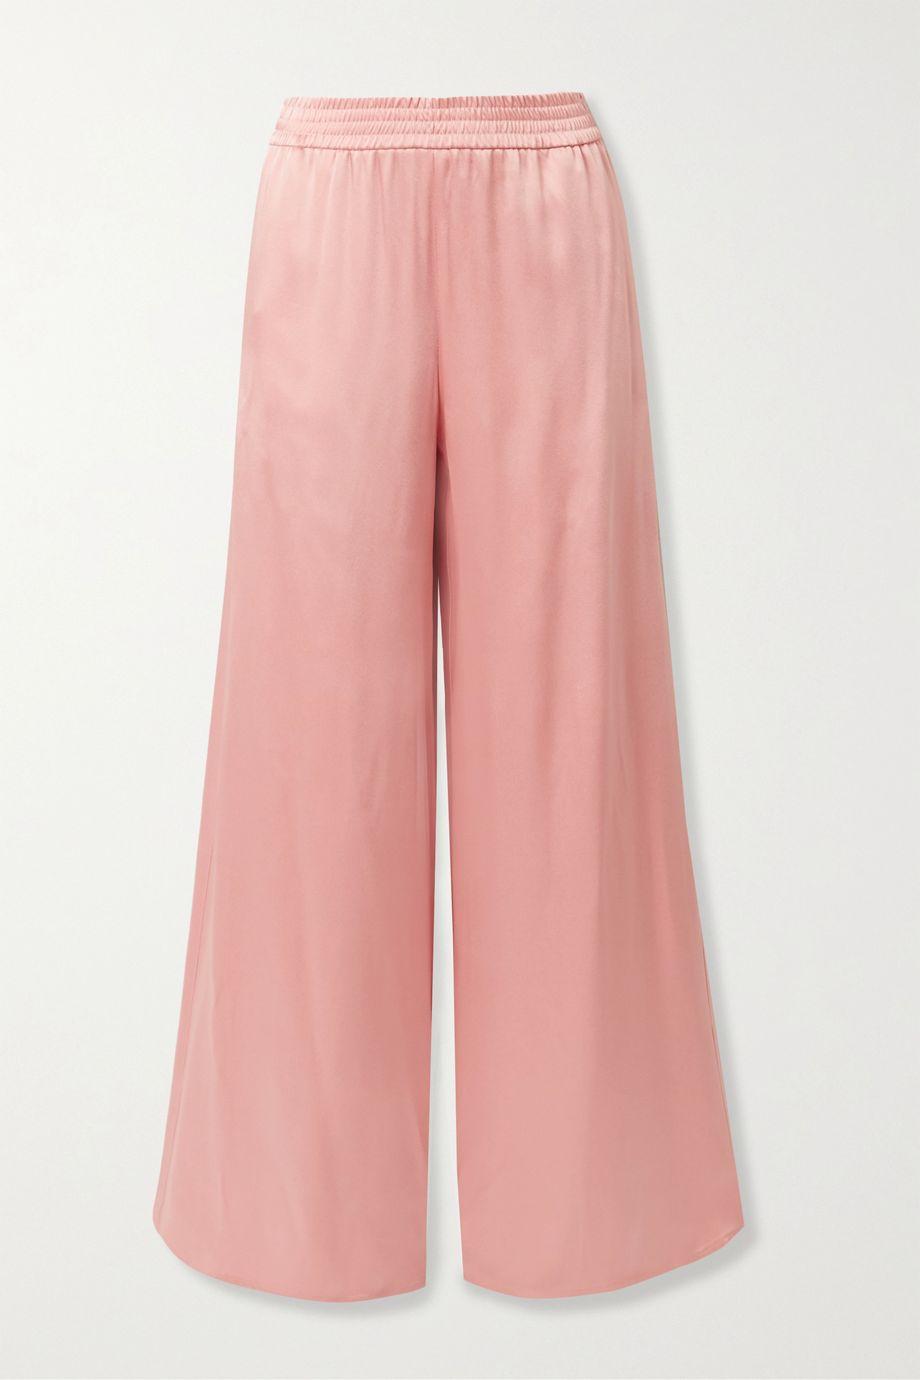 Sally LaPointe Satin-crepe wide-leg pants